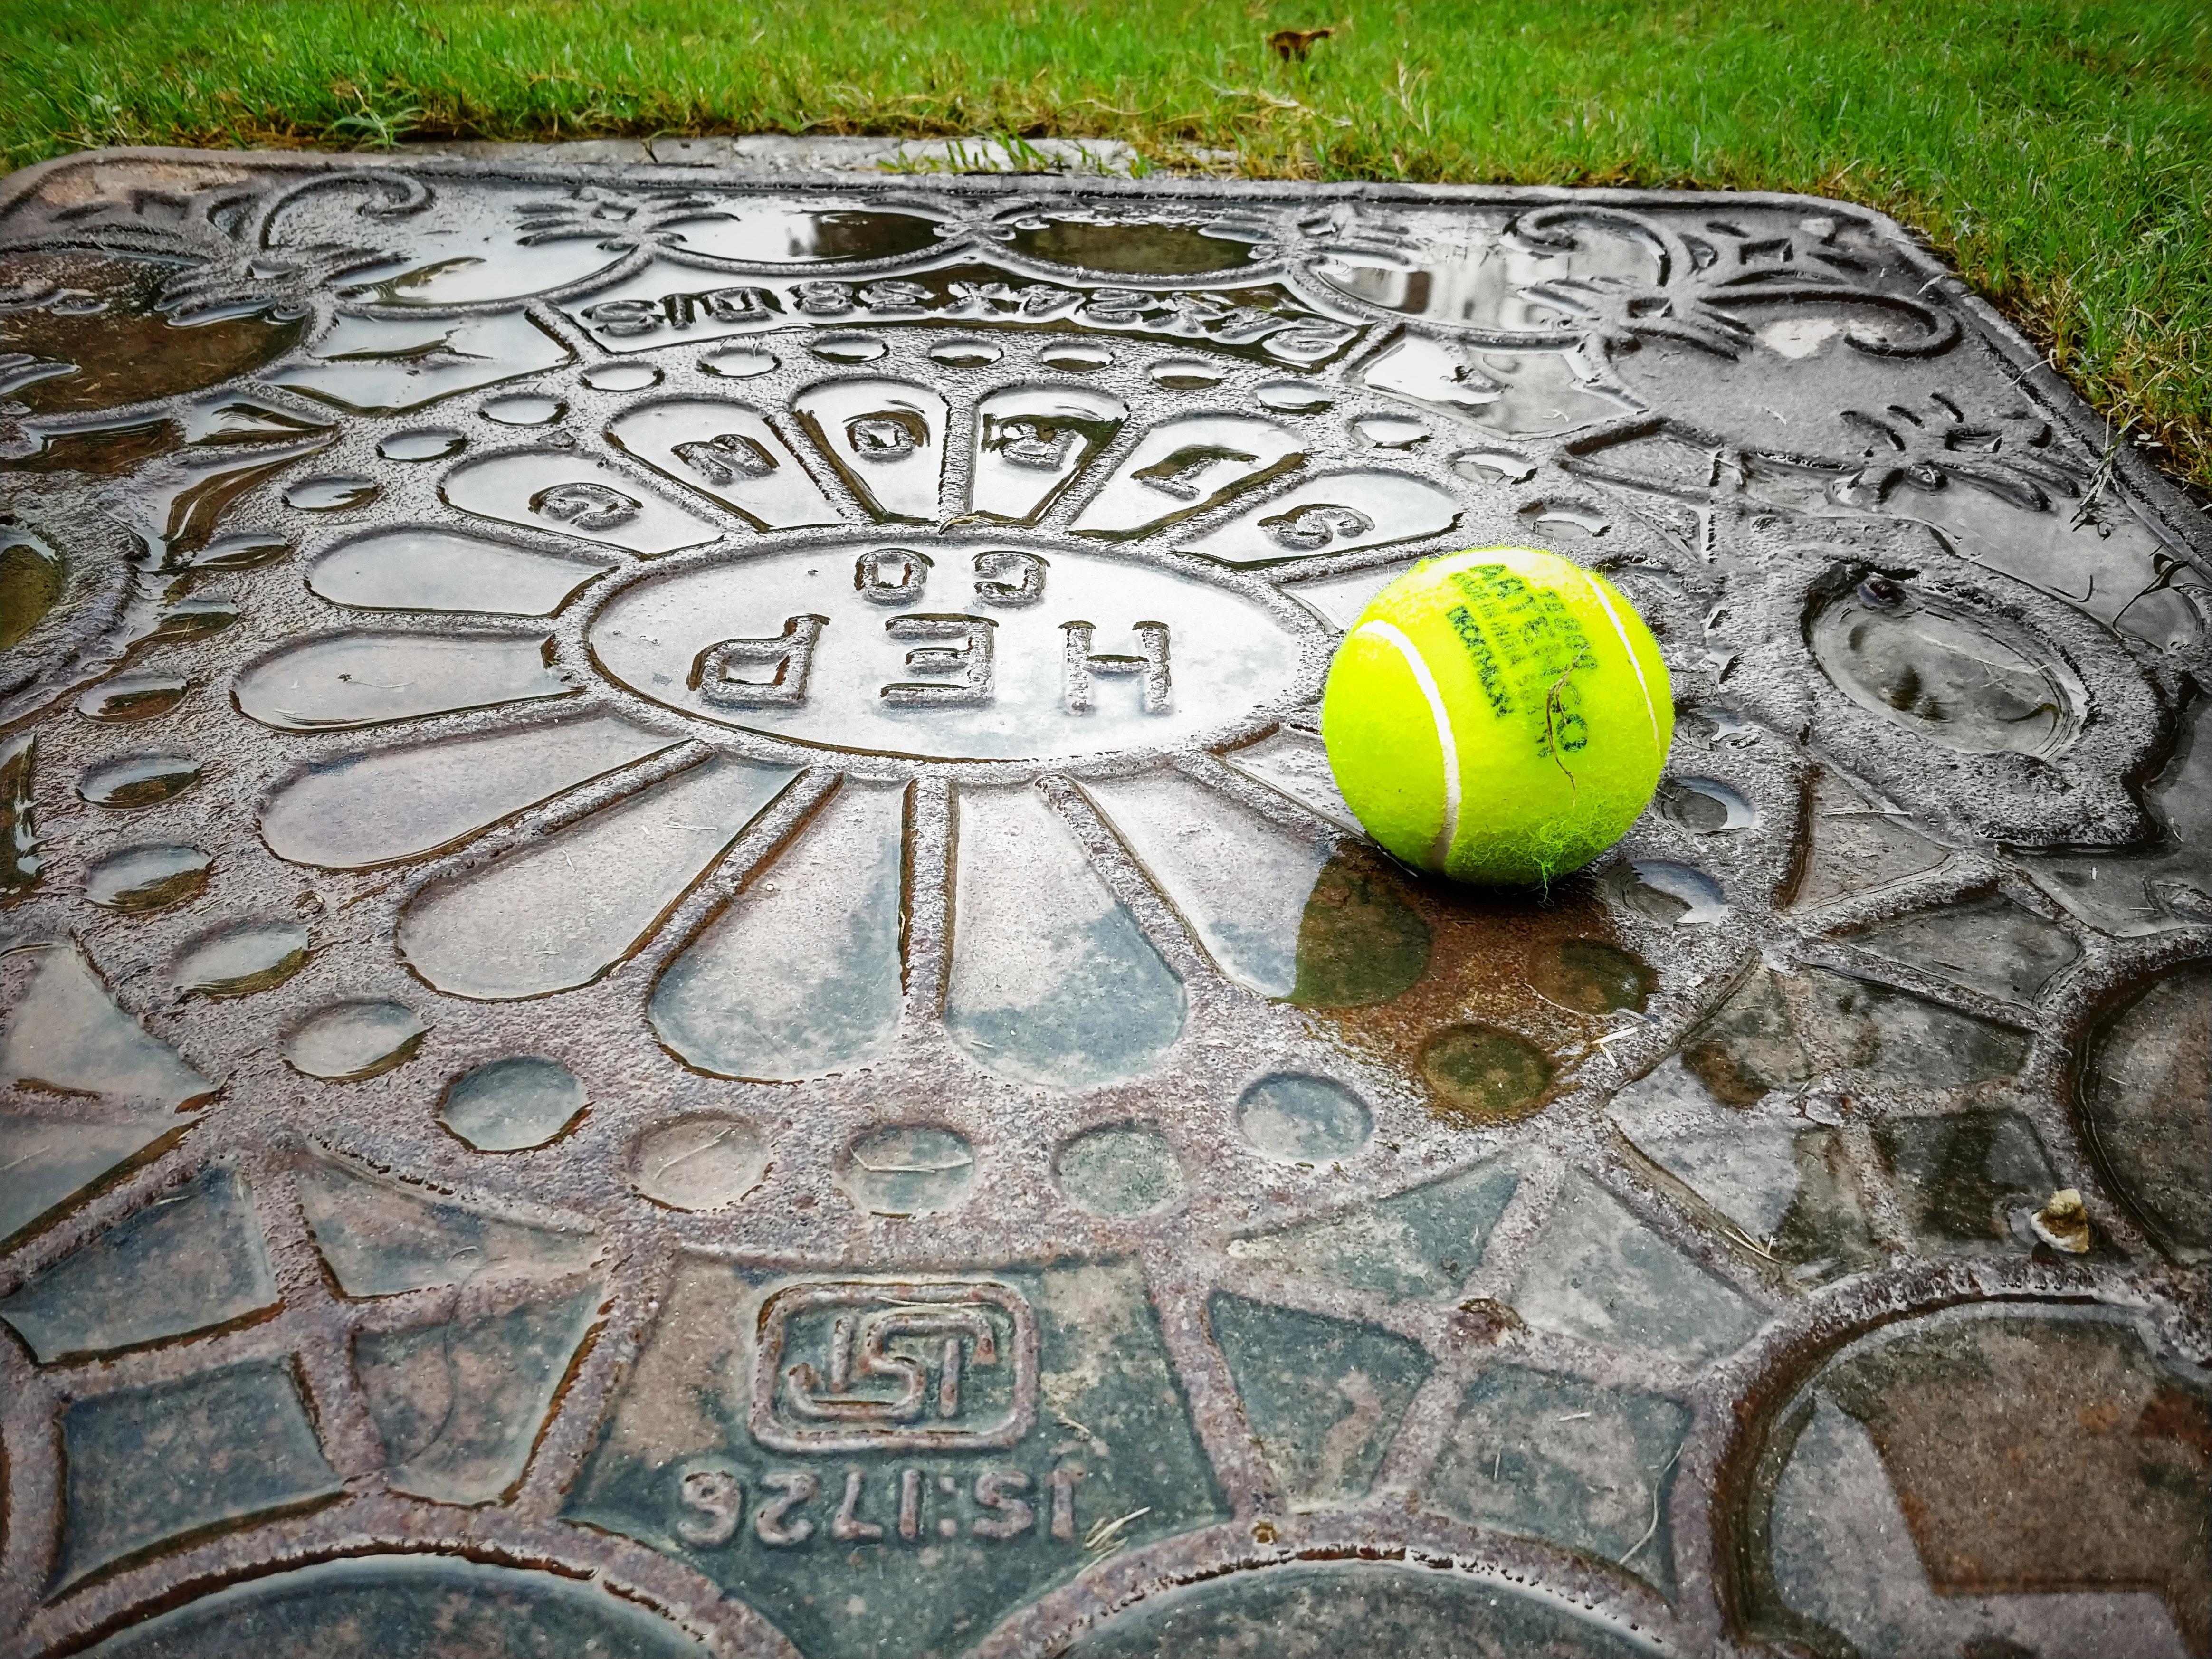 Free stock photo of ball, Ball on the ground, tennis ball